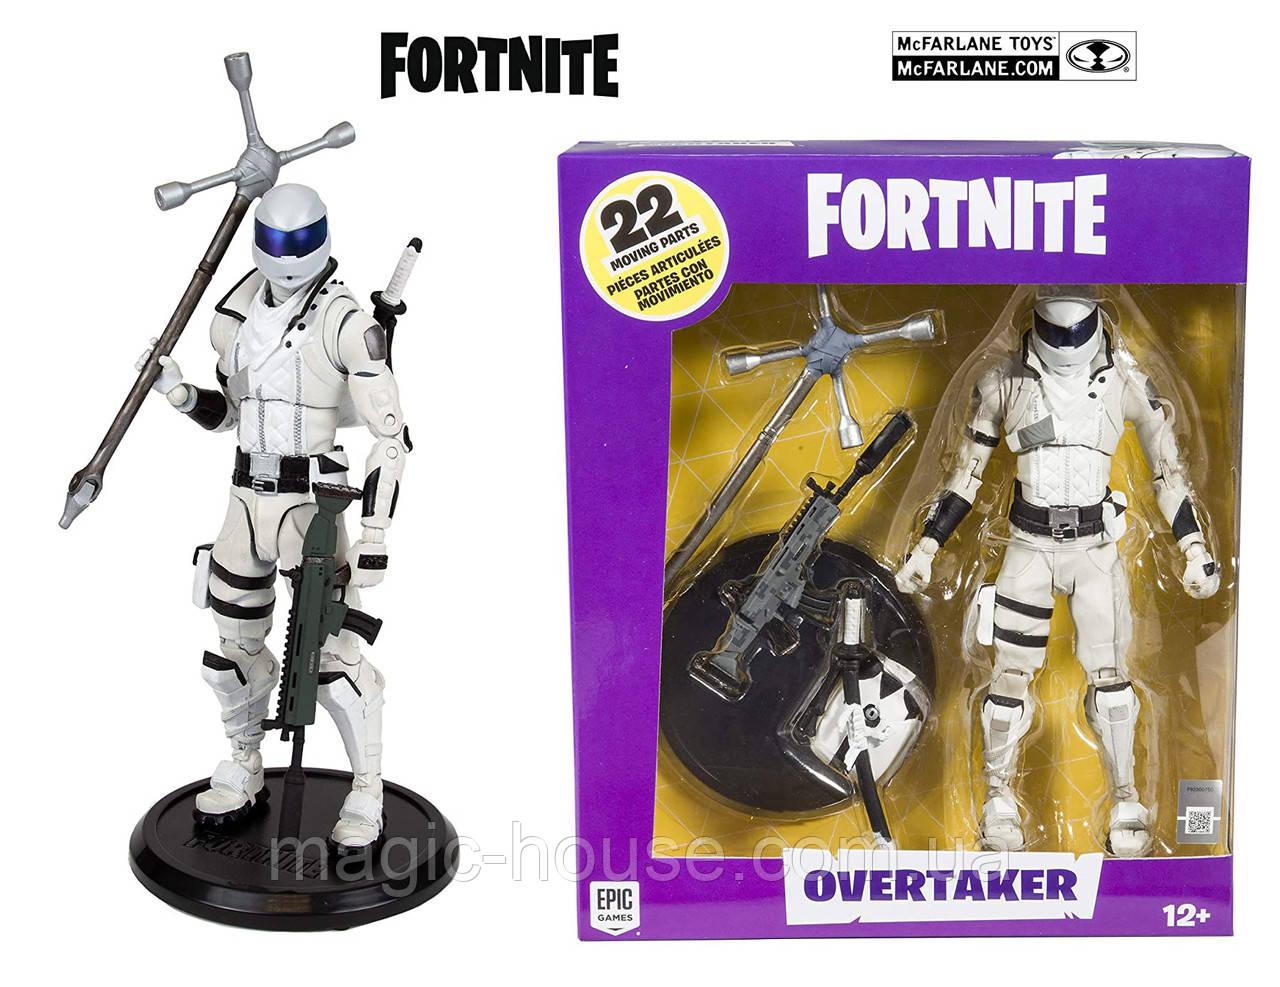 Коллекционная фигурка Фортнайт Овертакер McFarlane Toys Fortnite Overtaker Premium Action Figure оригинал